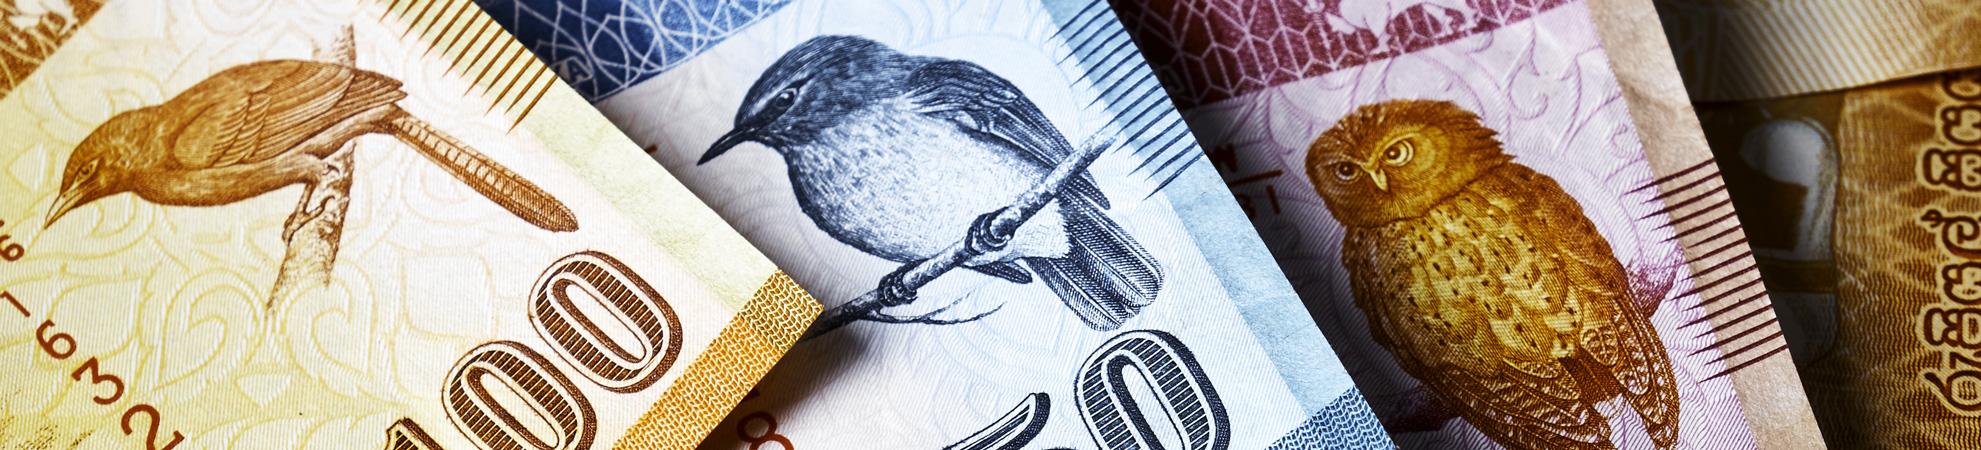 Bien organiser son argent avant son circuit au Sri Lanka